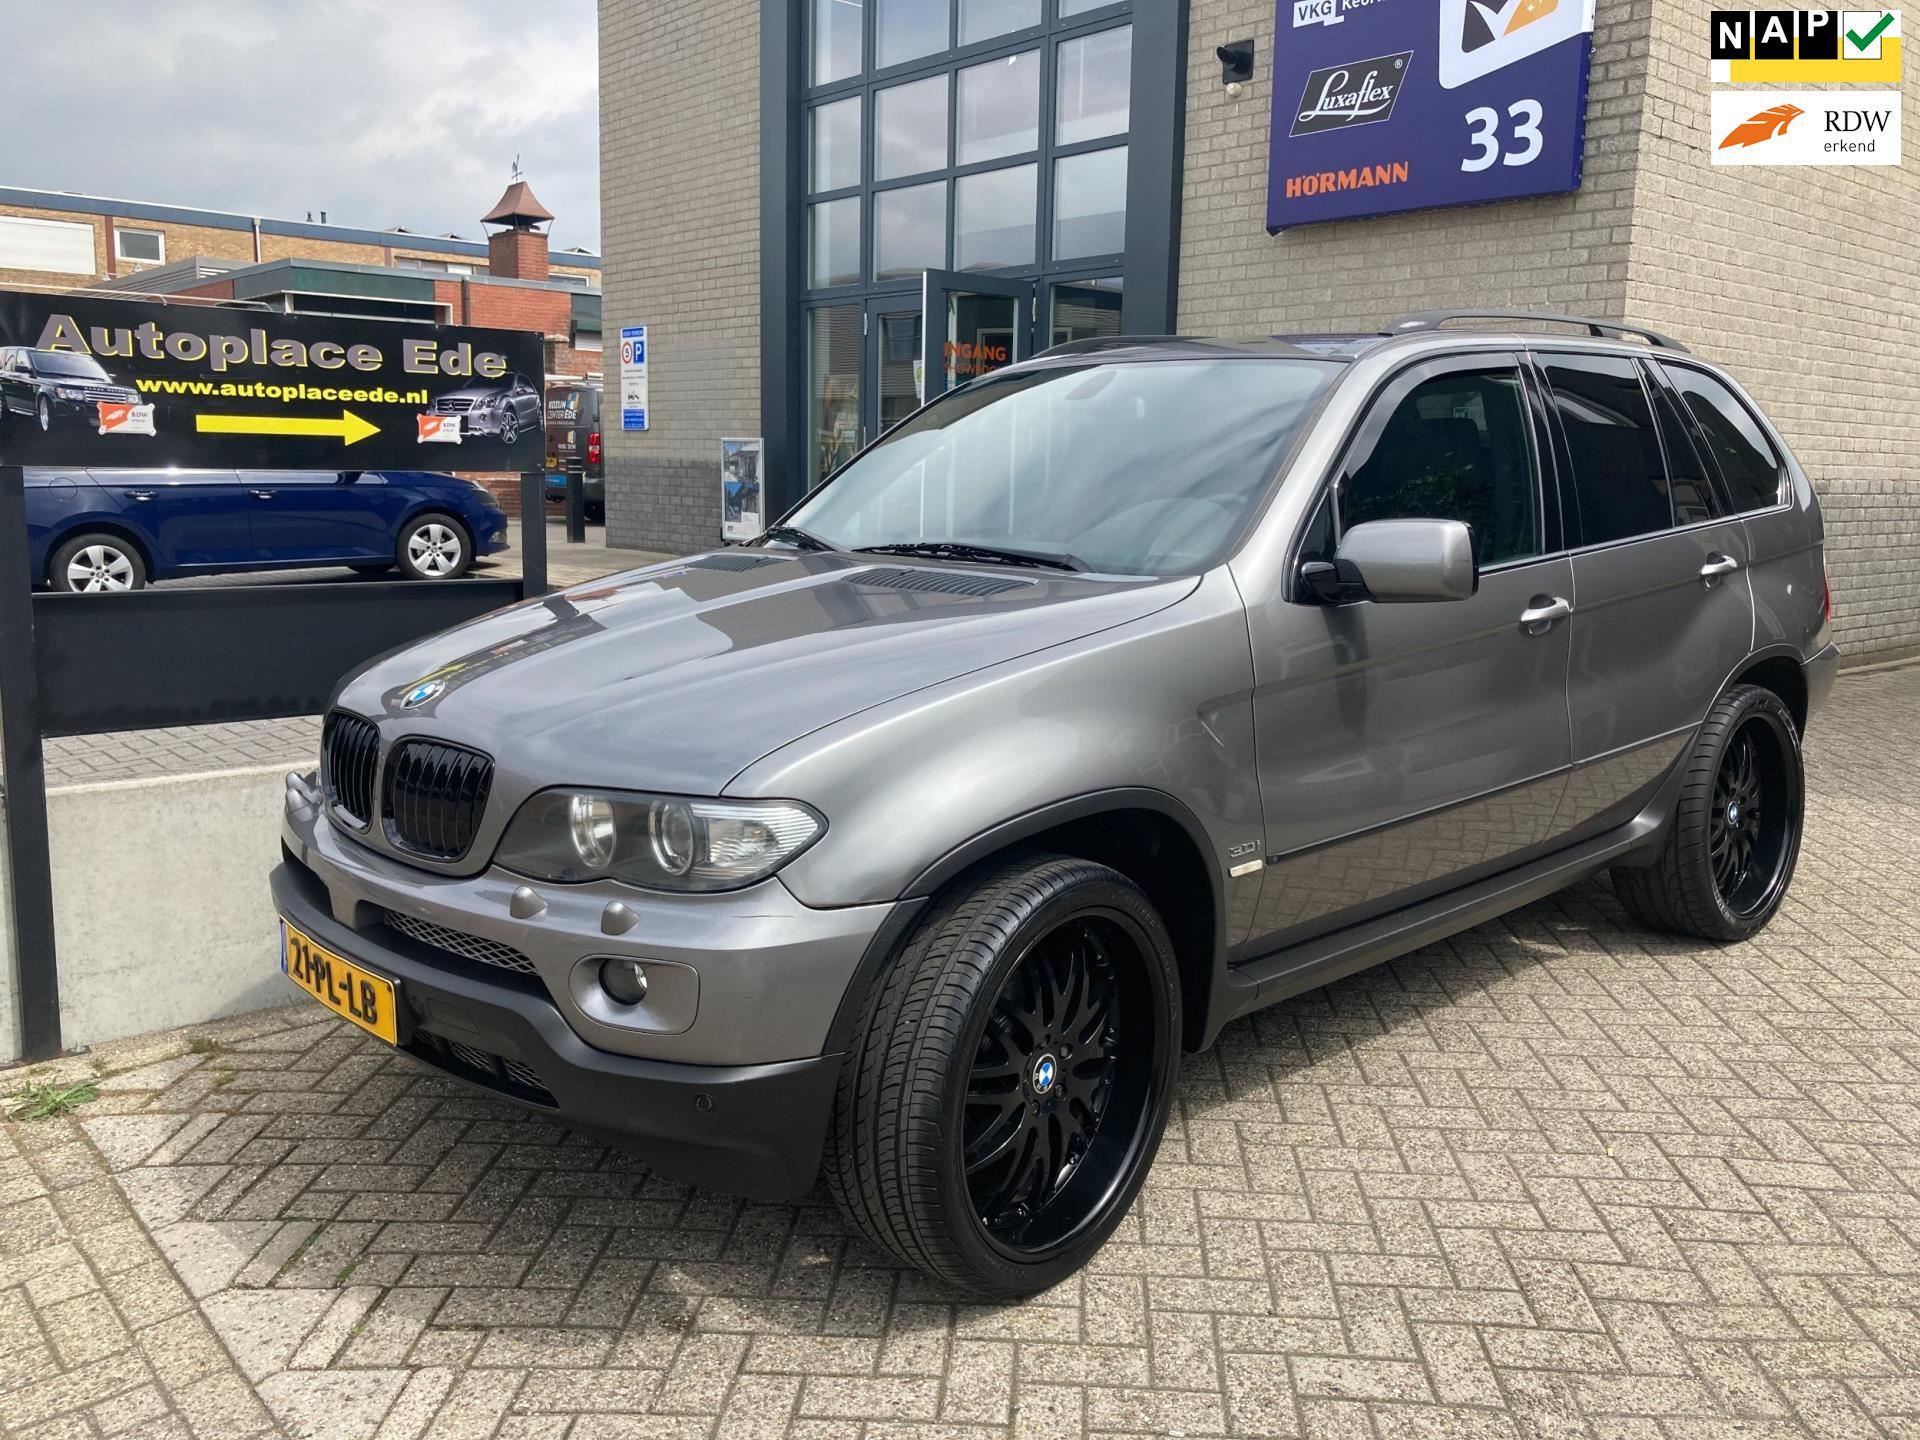 BMW X5 occasion - autoplaceede